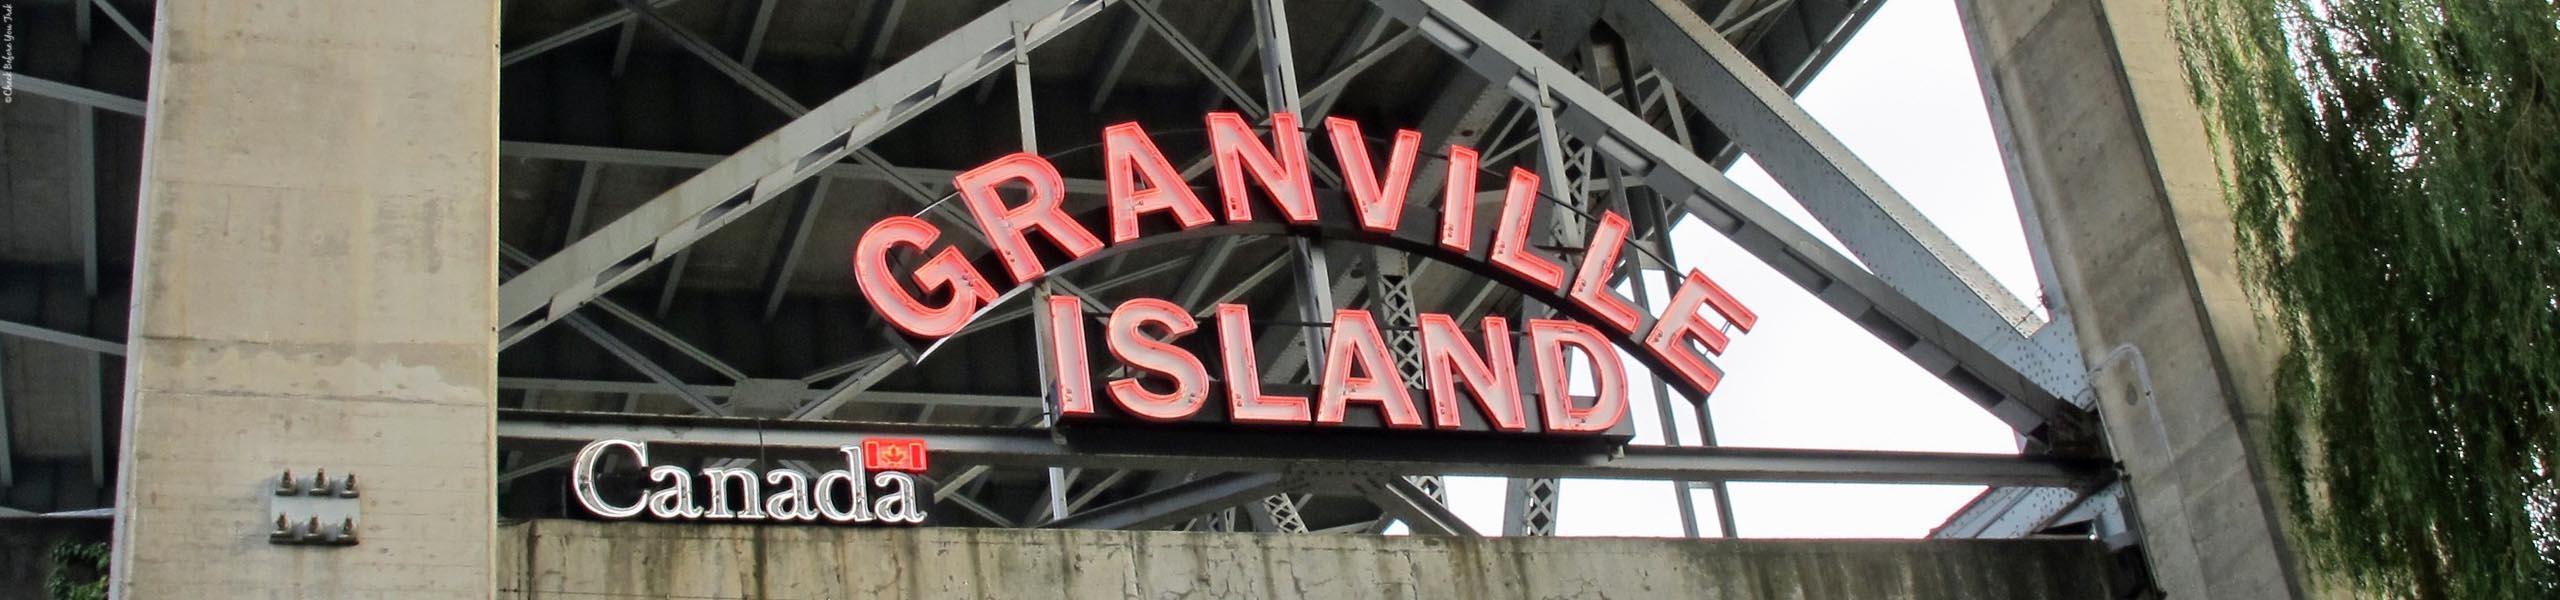 Featured Photo Granville Island - Vancouver, British Columbia, Canada